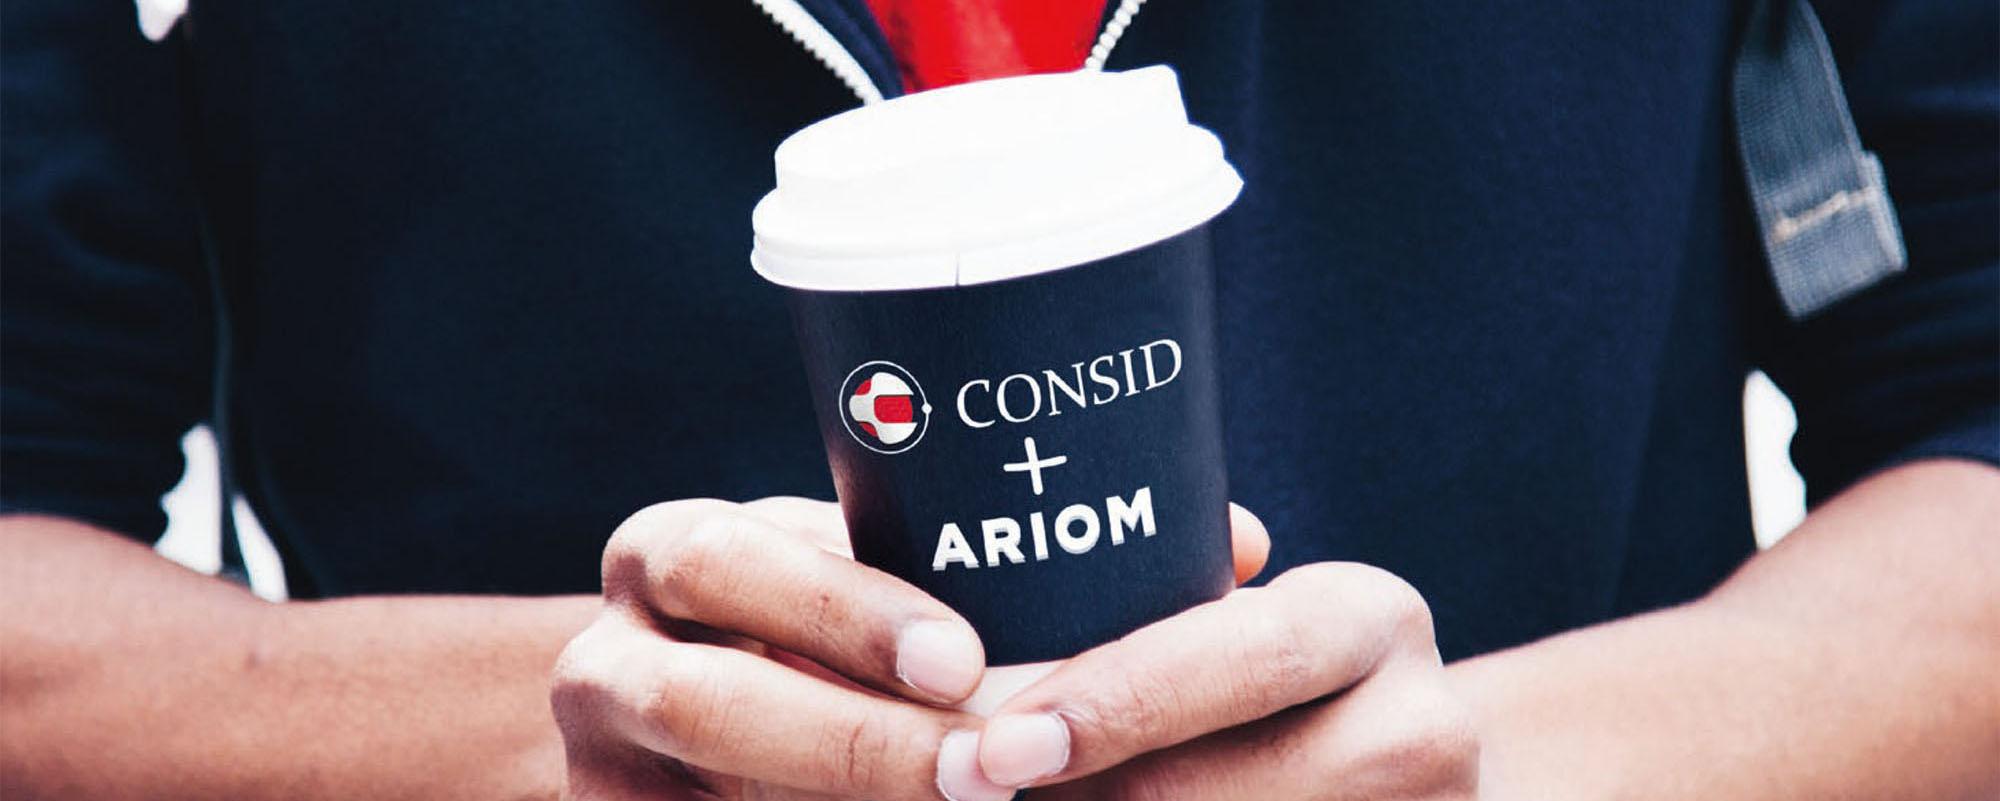 Consid + Ariom